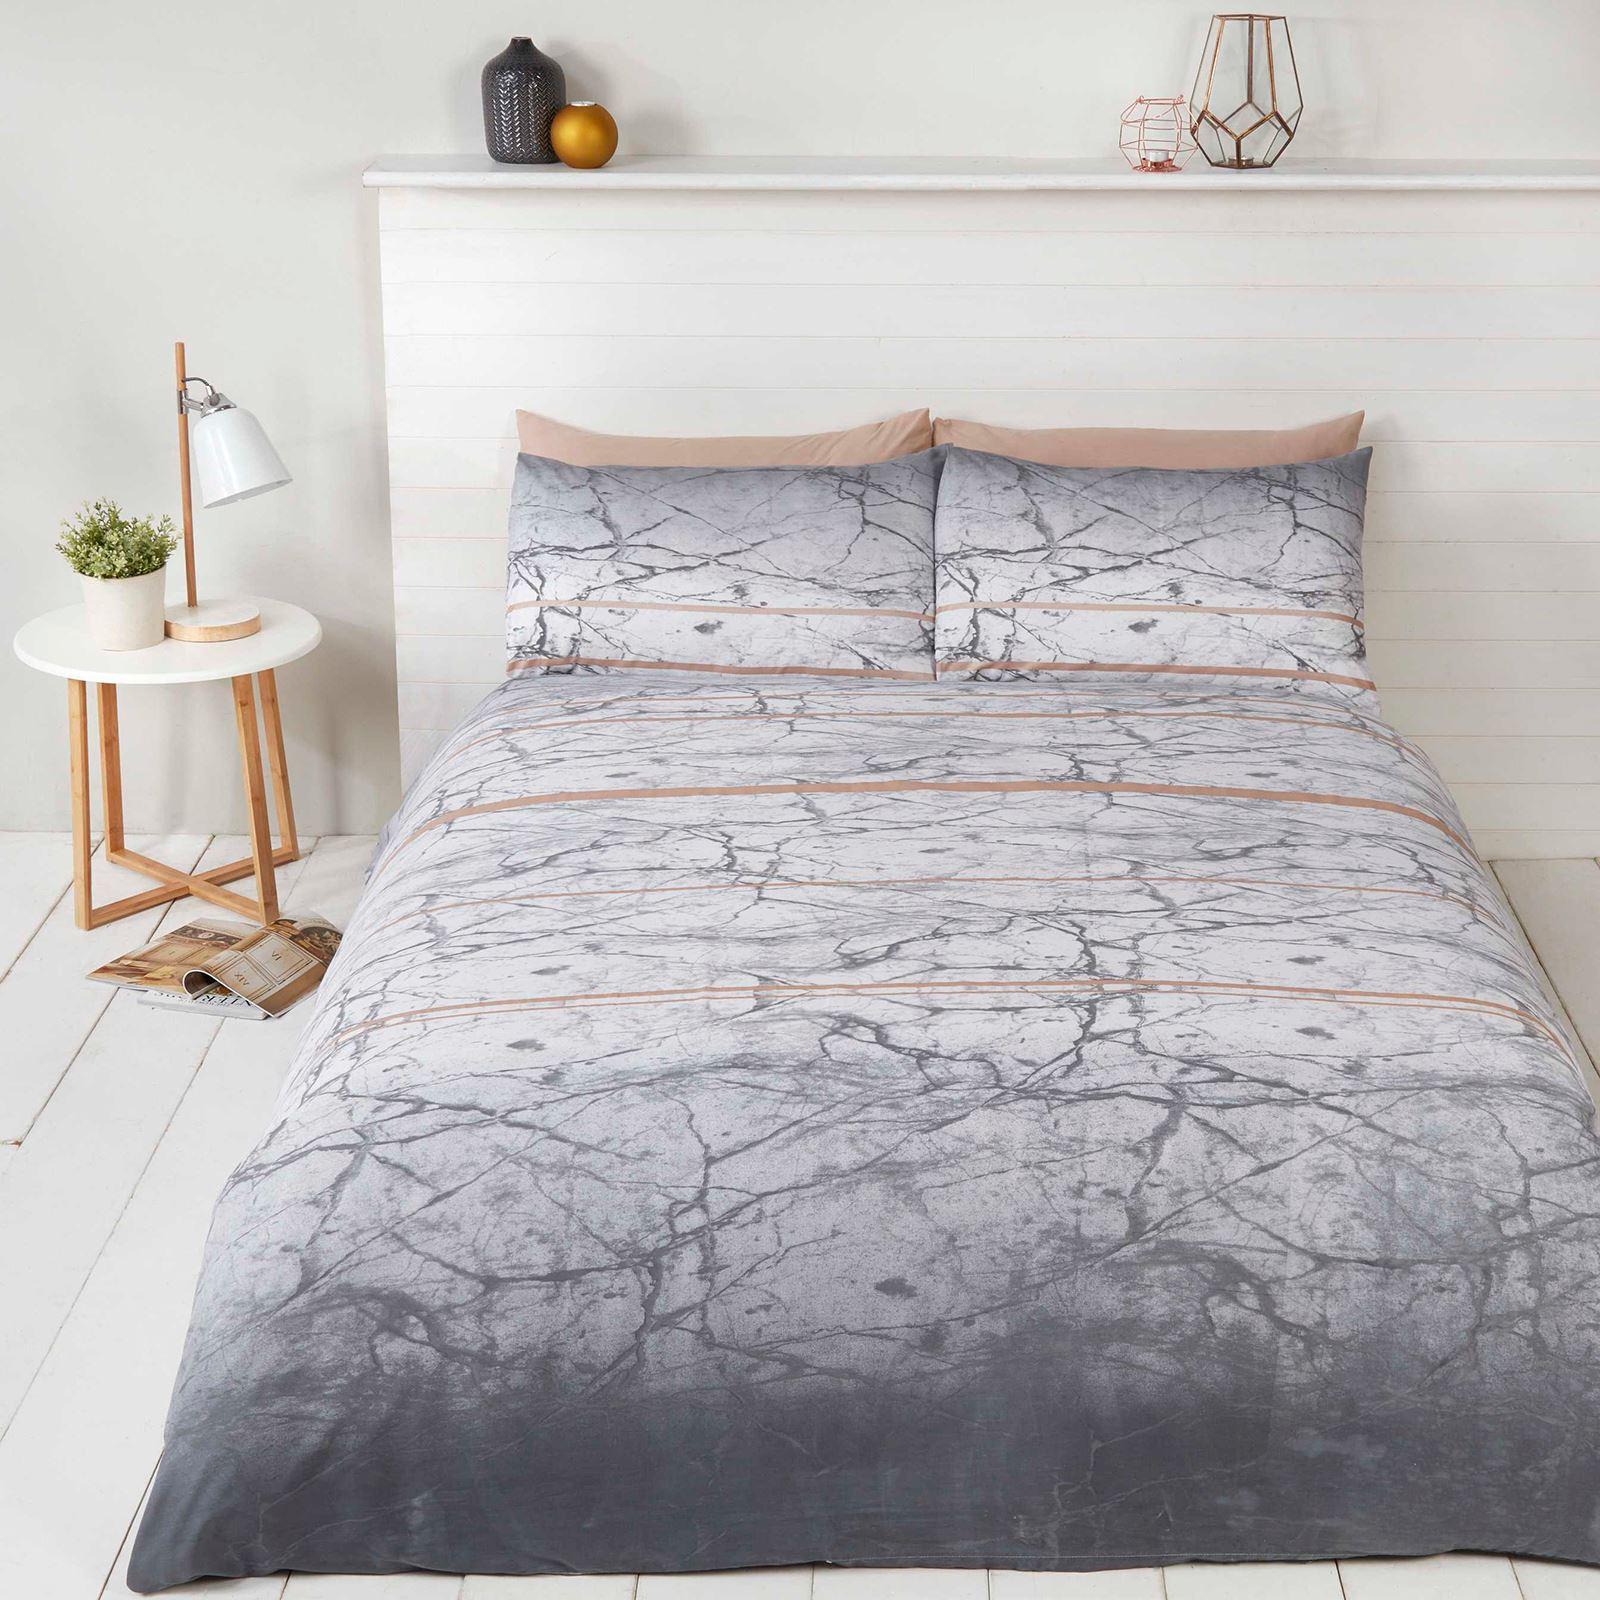 marble duvet cover set bedding grey white rose gold single double king size ebay. Black Bedroom Furniture Sets. Home Design Ideas